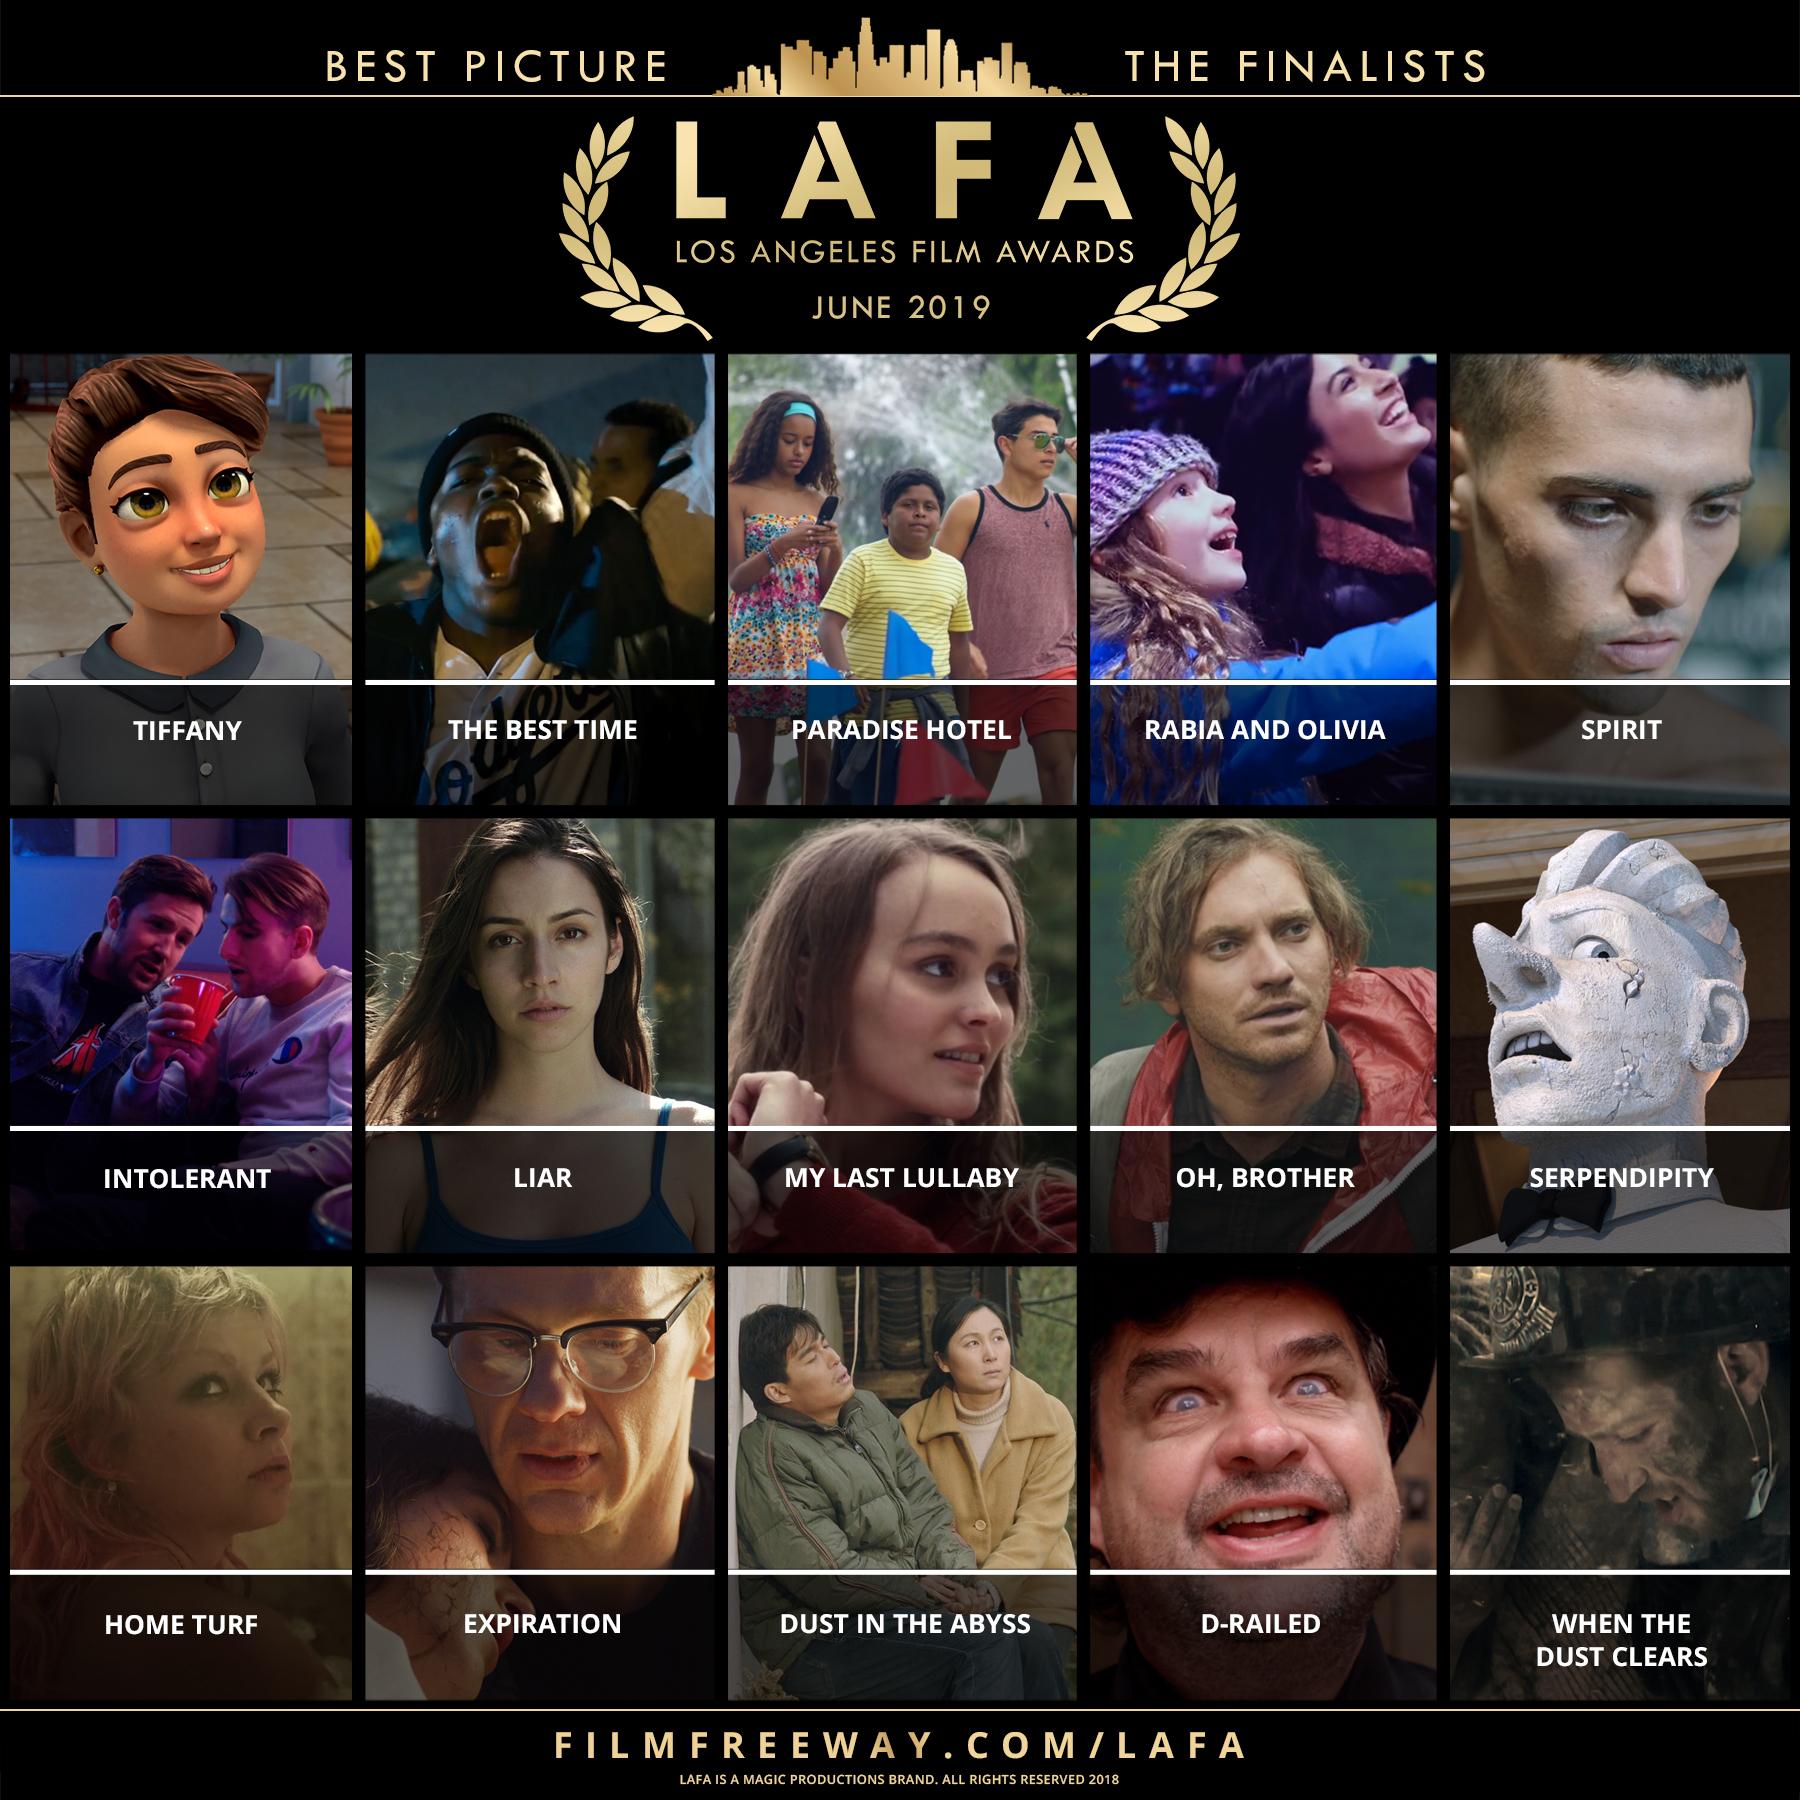 LAFA FINALISTS 2019 06